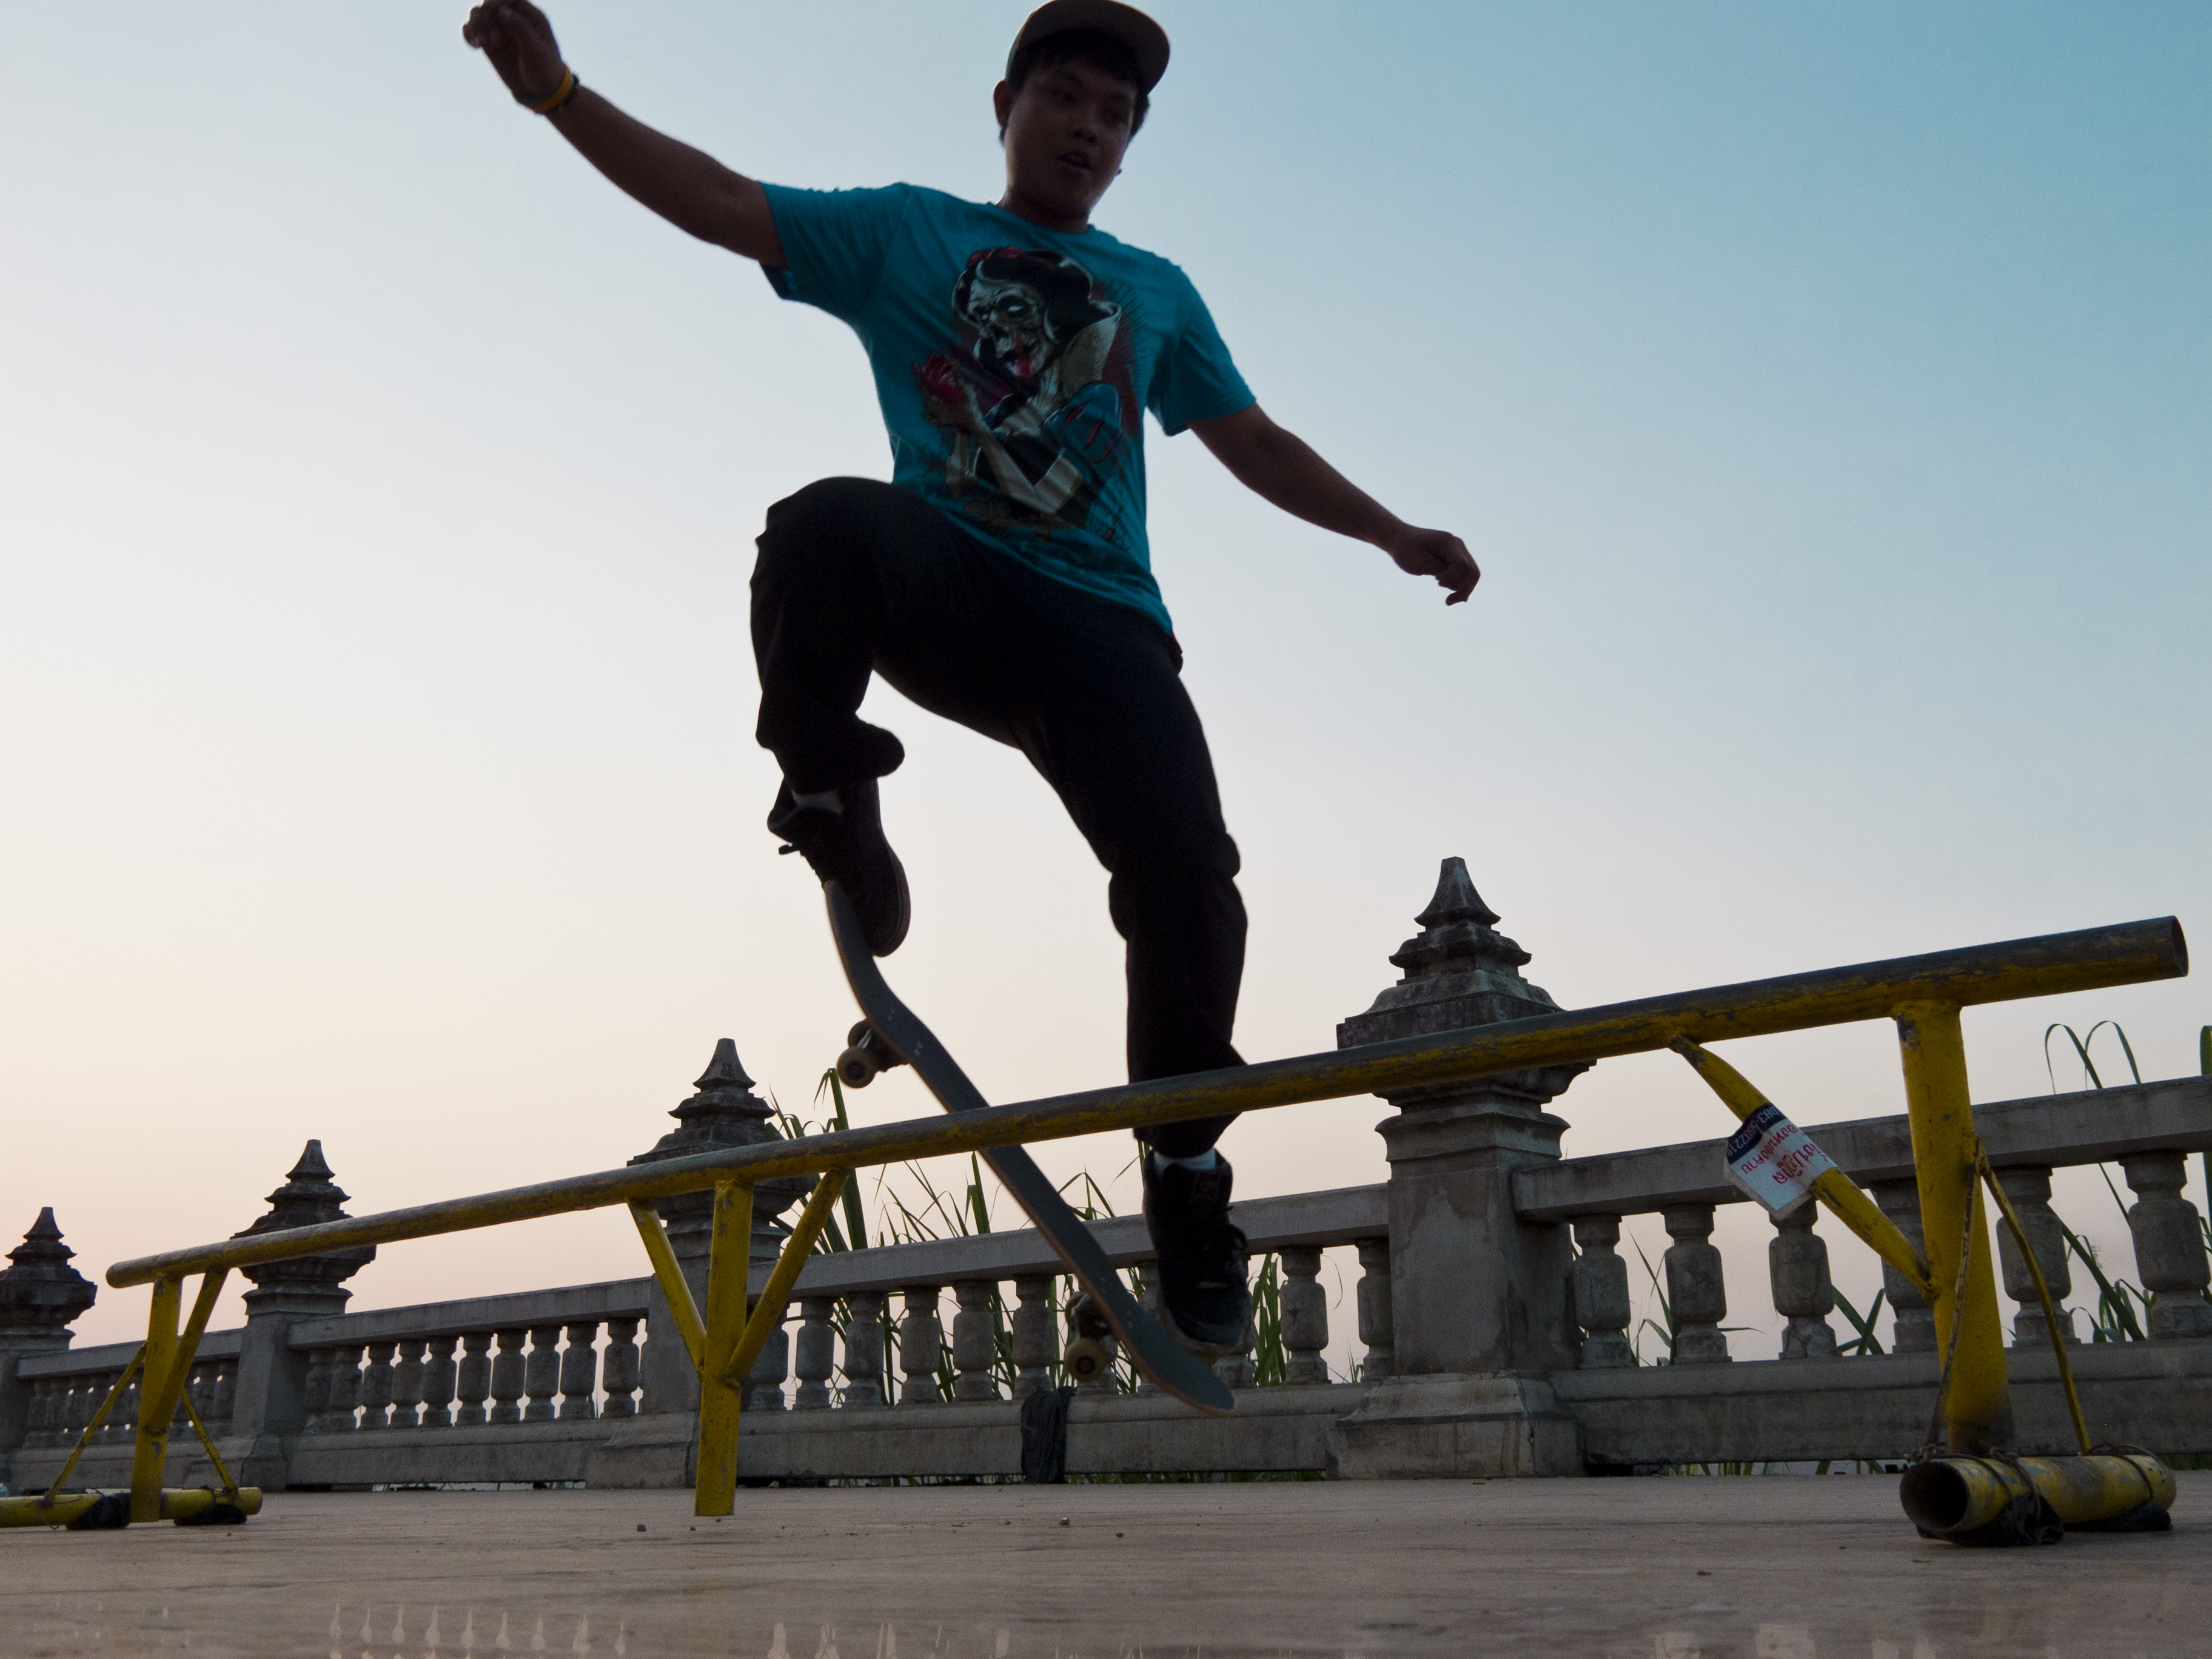 Skateboarder di Nong Khai (Thailandia)